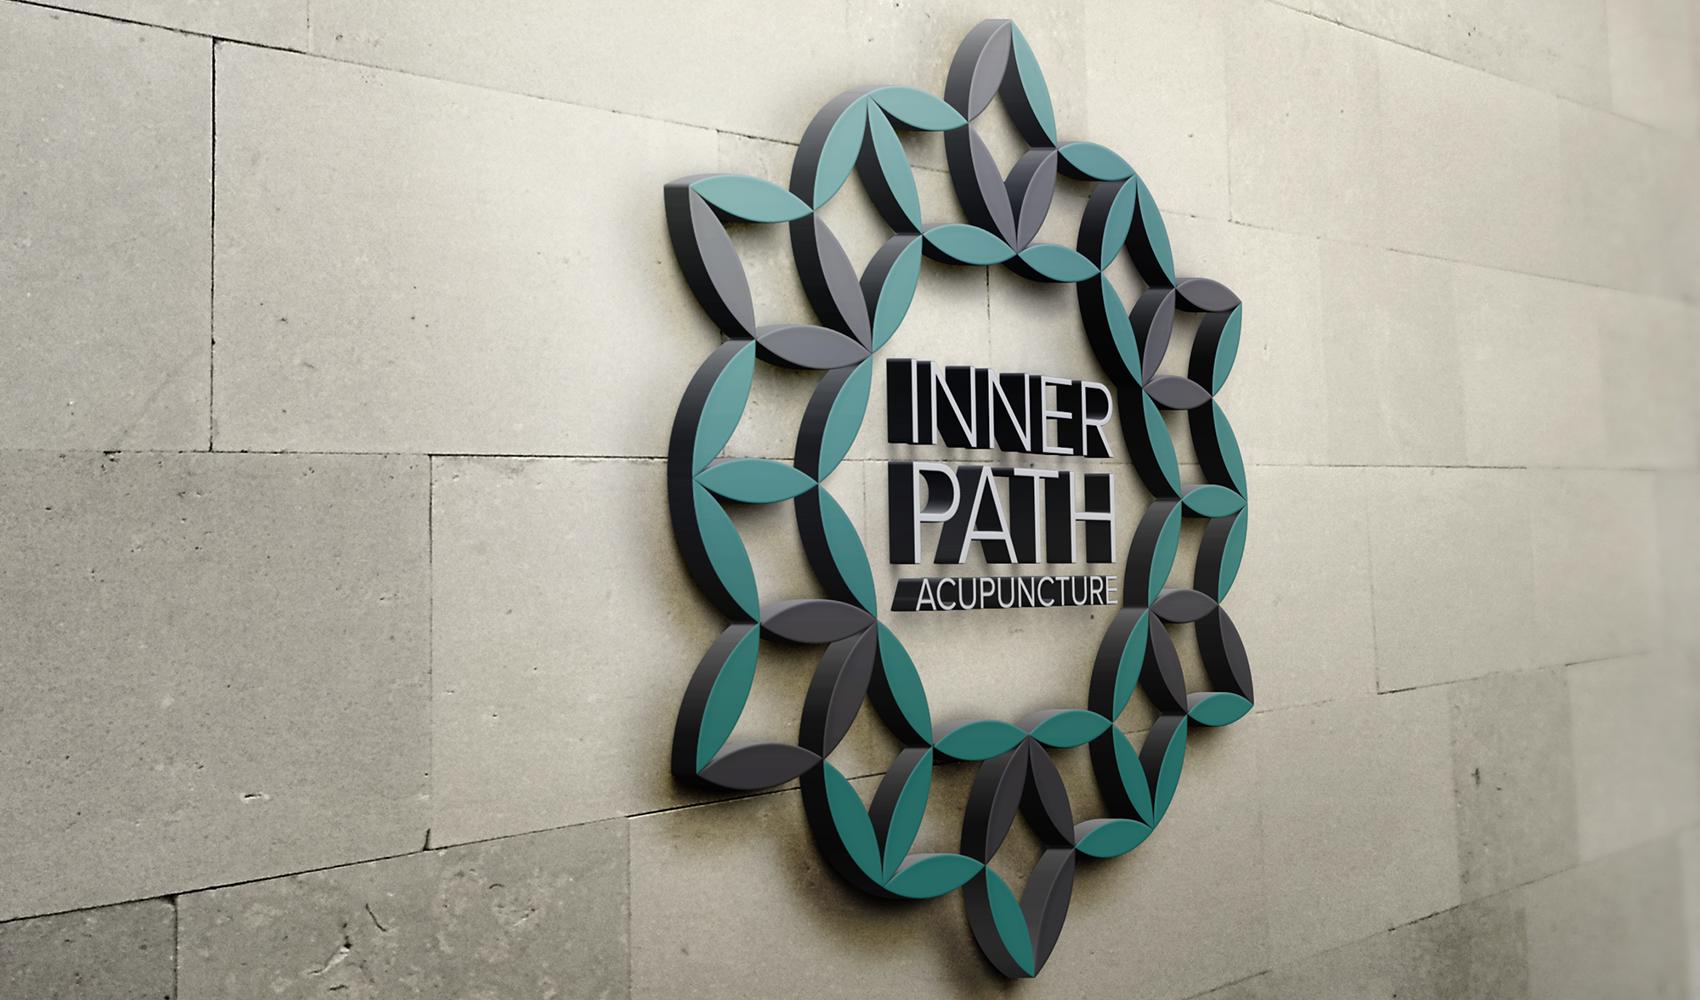 Inner Path Acupuncture Identity